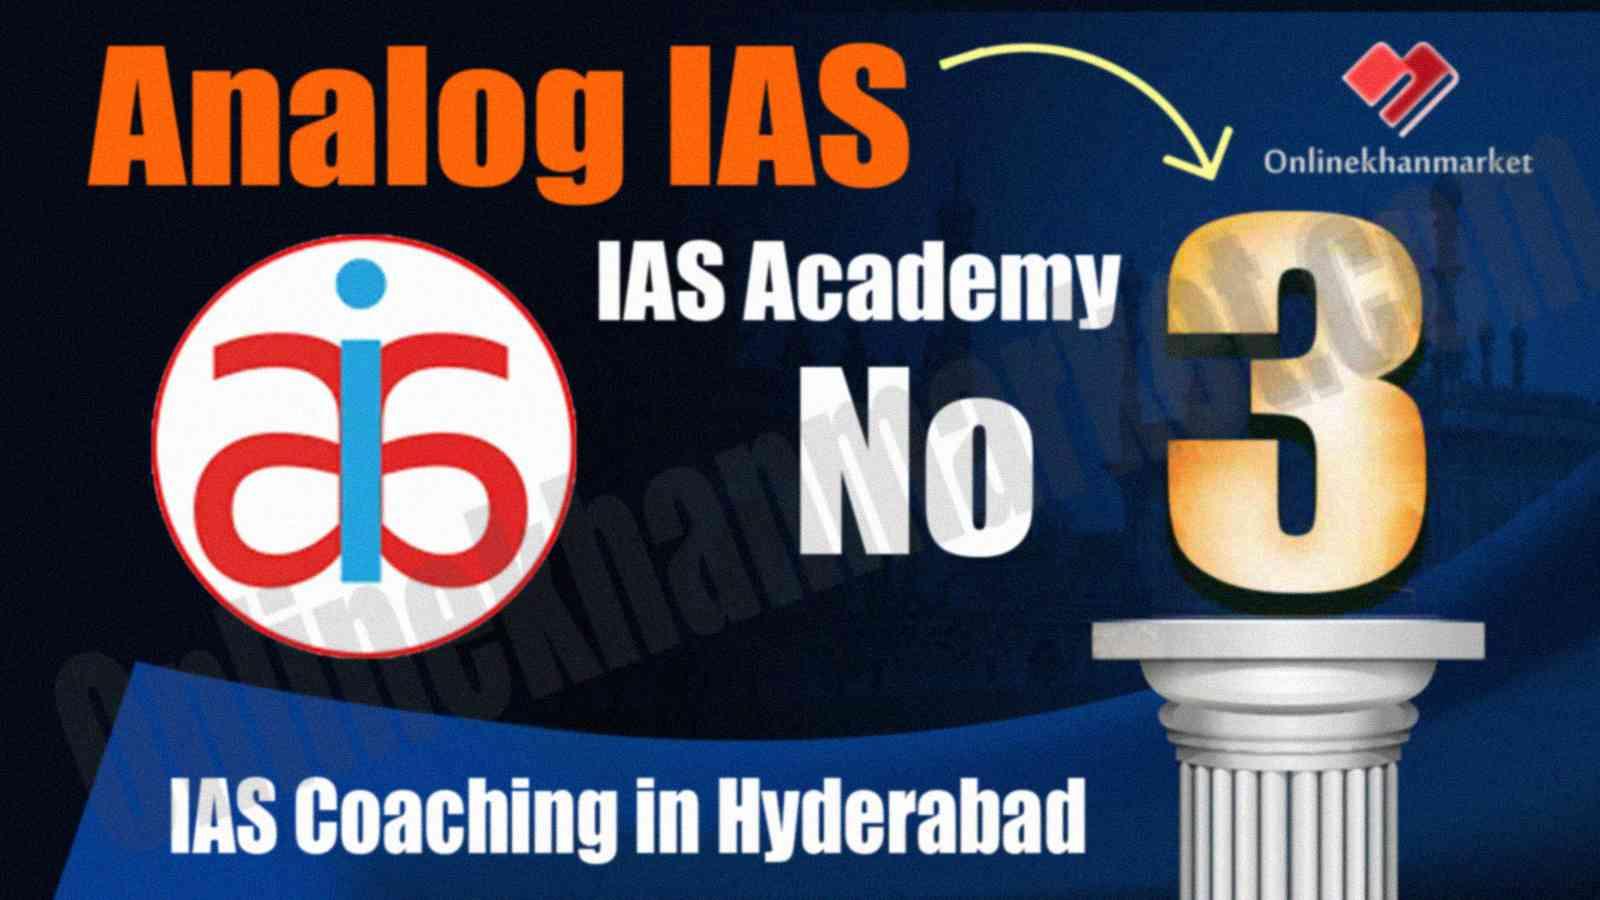 Top IAS Coaching in Hyderabad